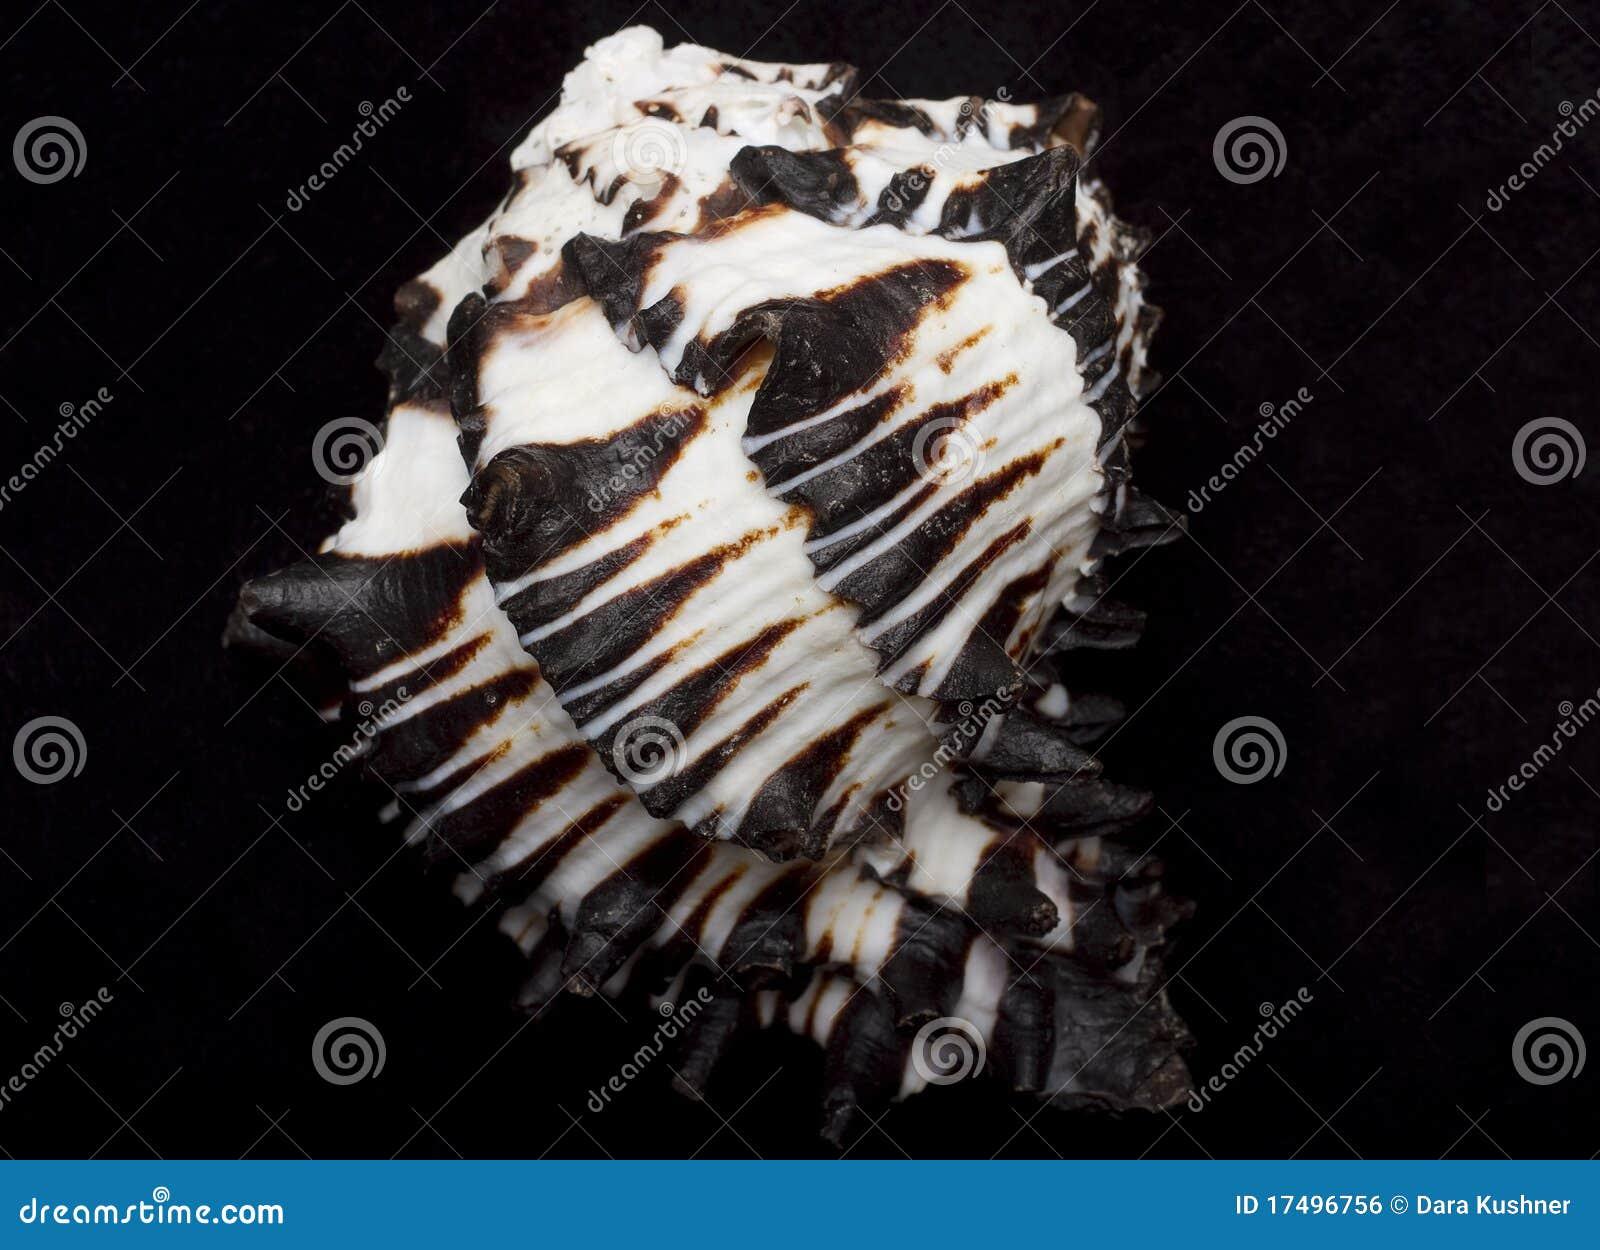 Seashell blanco y negro